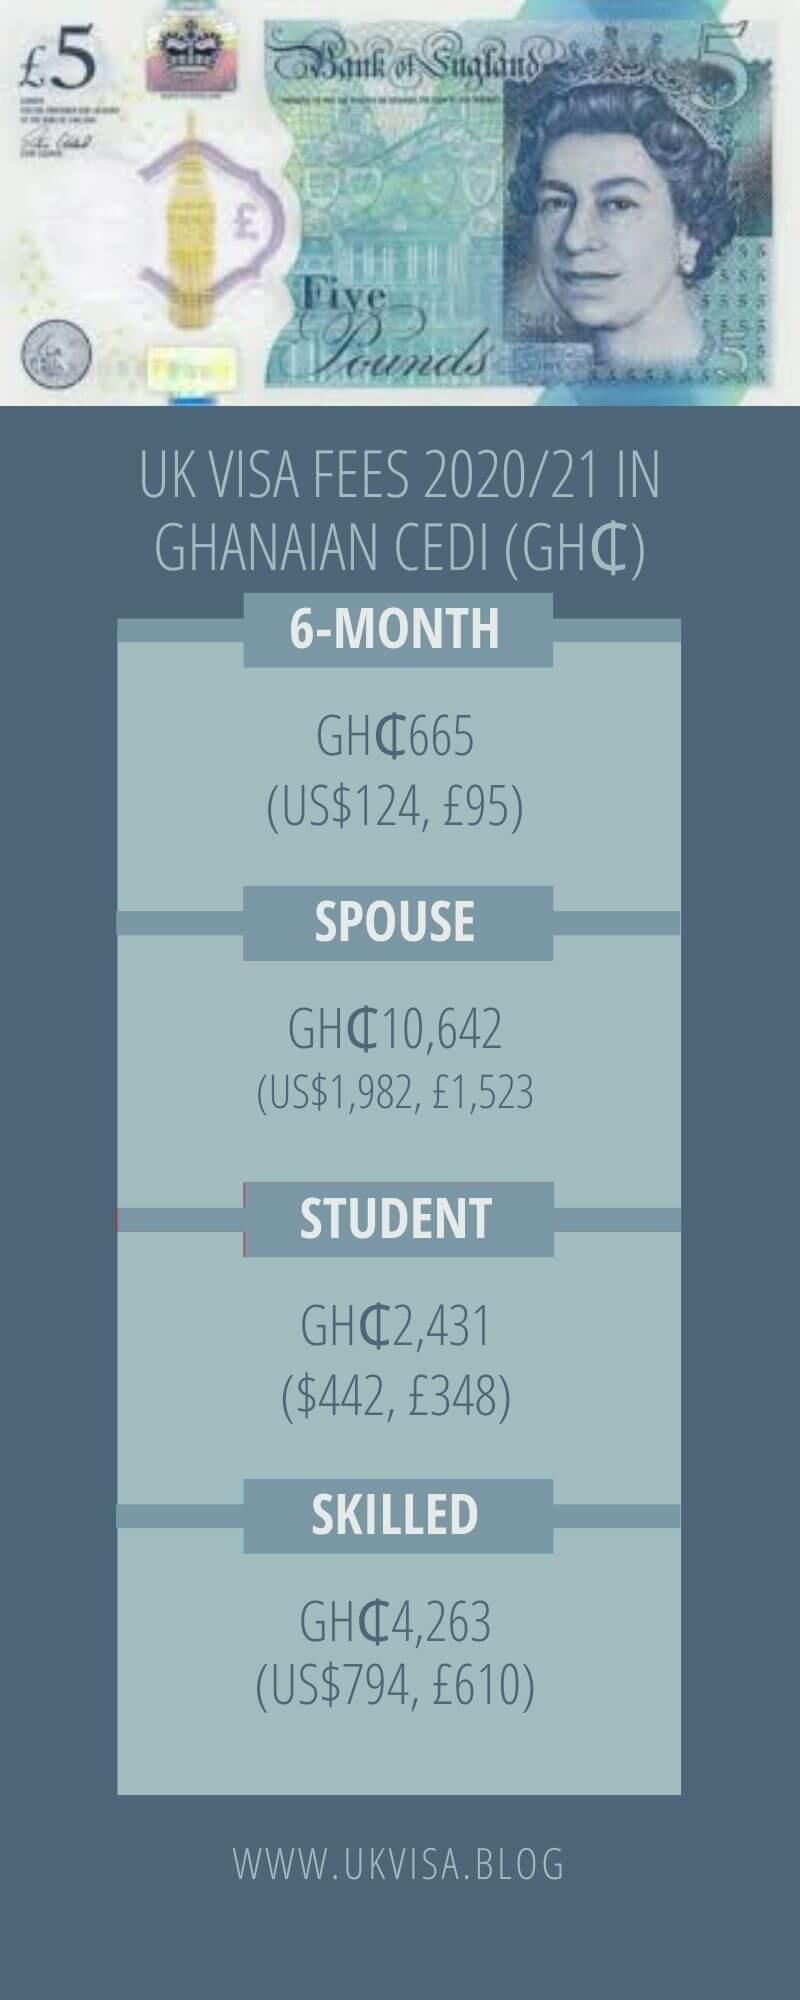 UK 6 Month Visit, Tourist, Student, Spouse Visa Fees Ghana 2021